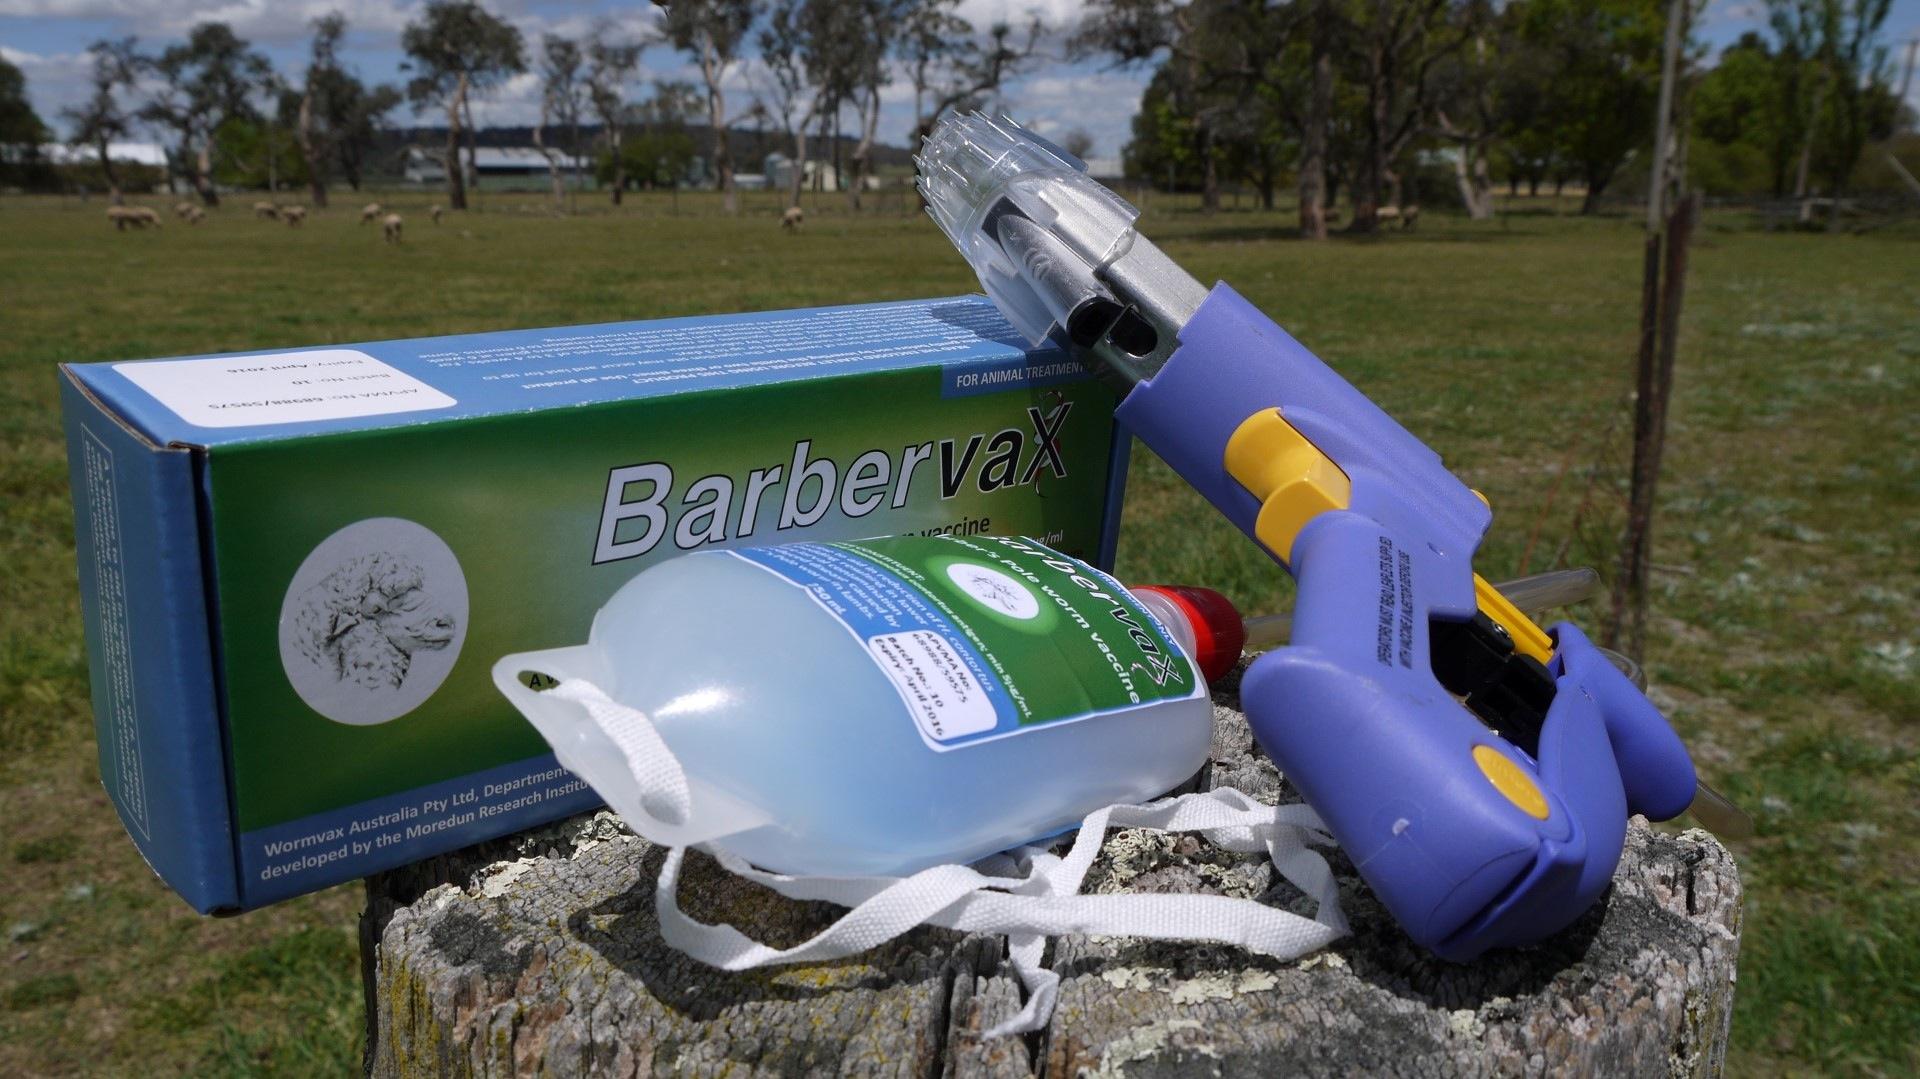 Barbervax product